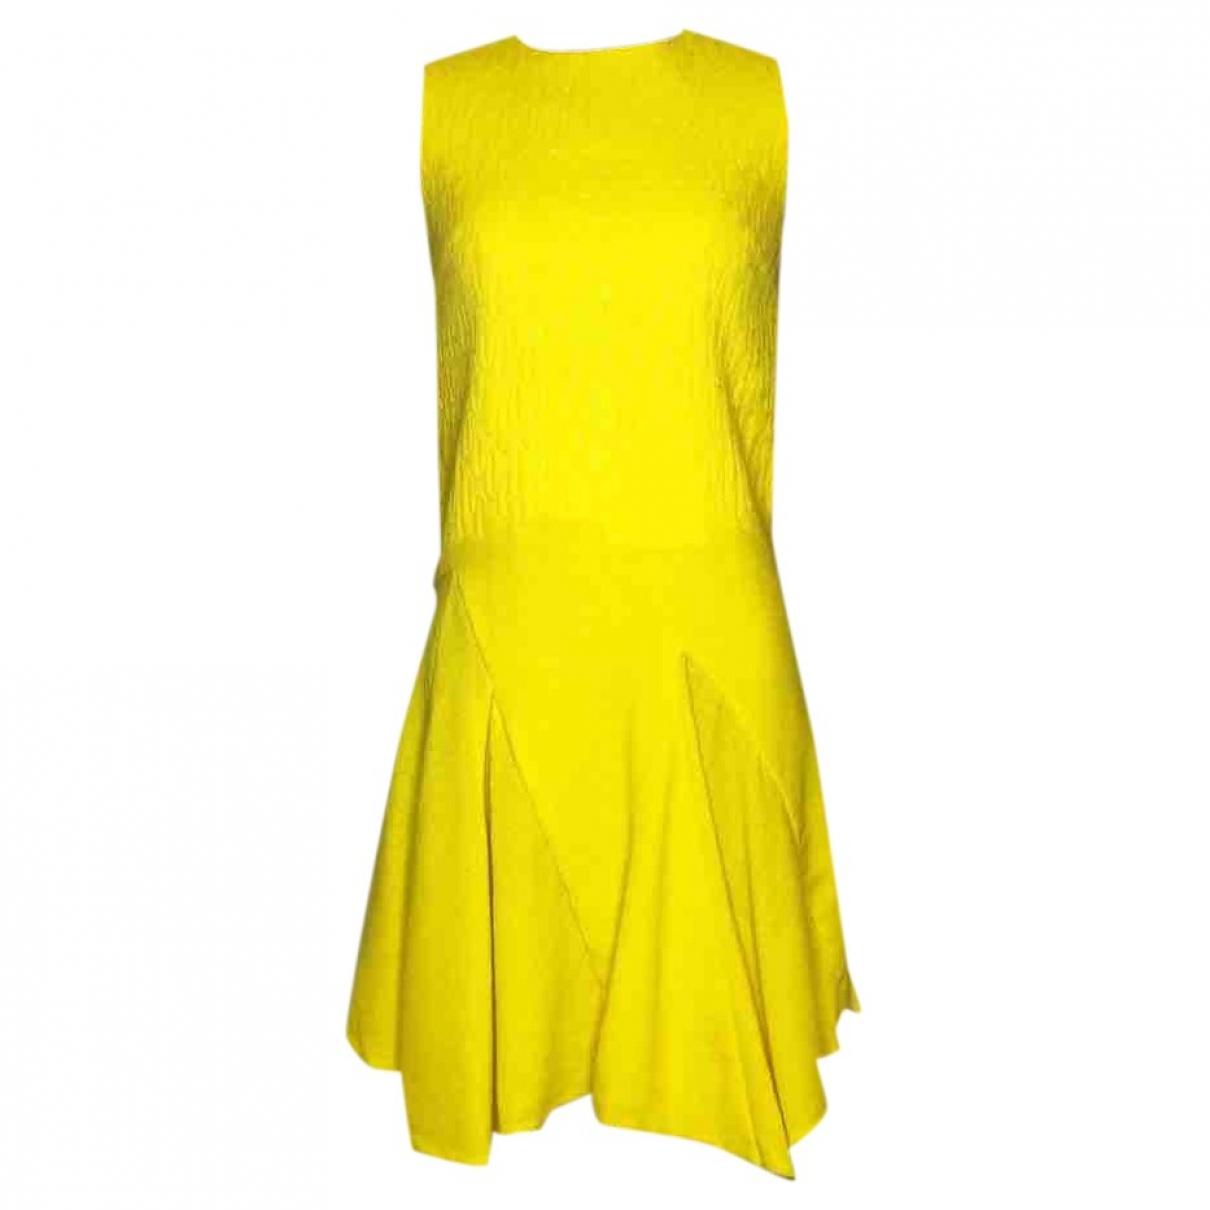 Dior \N Yellow Wool dress for Women 34 FR